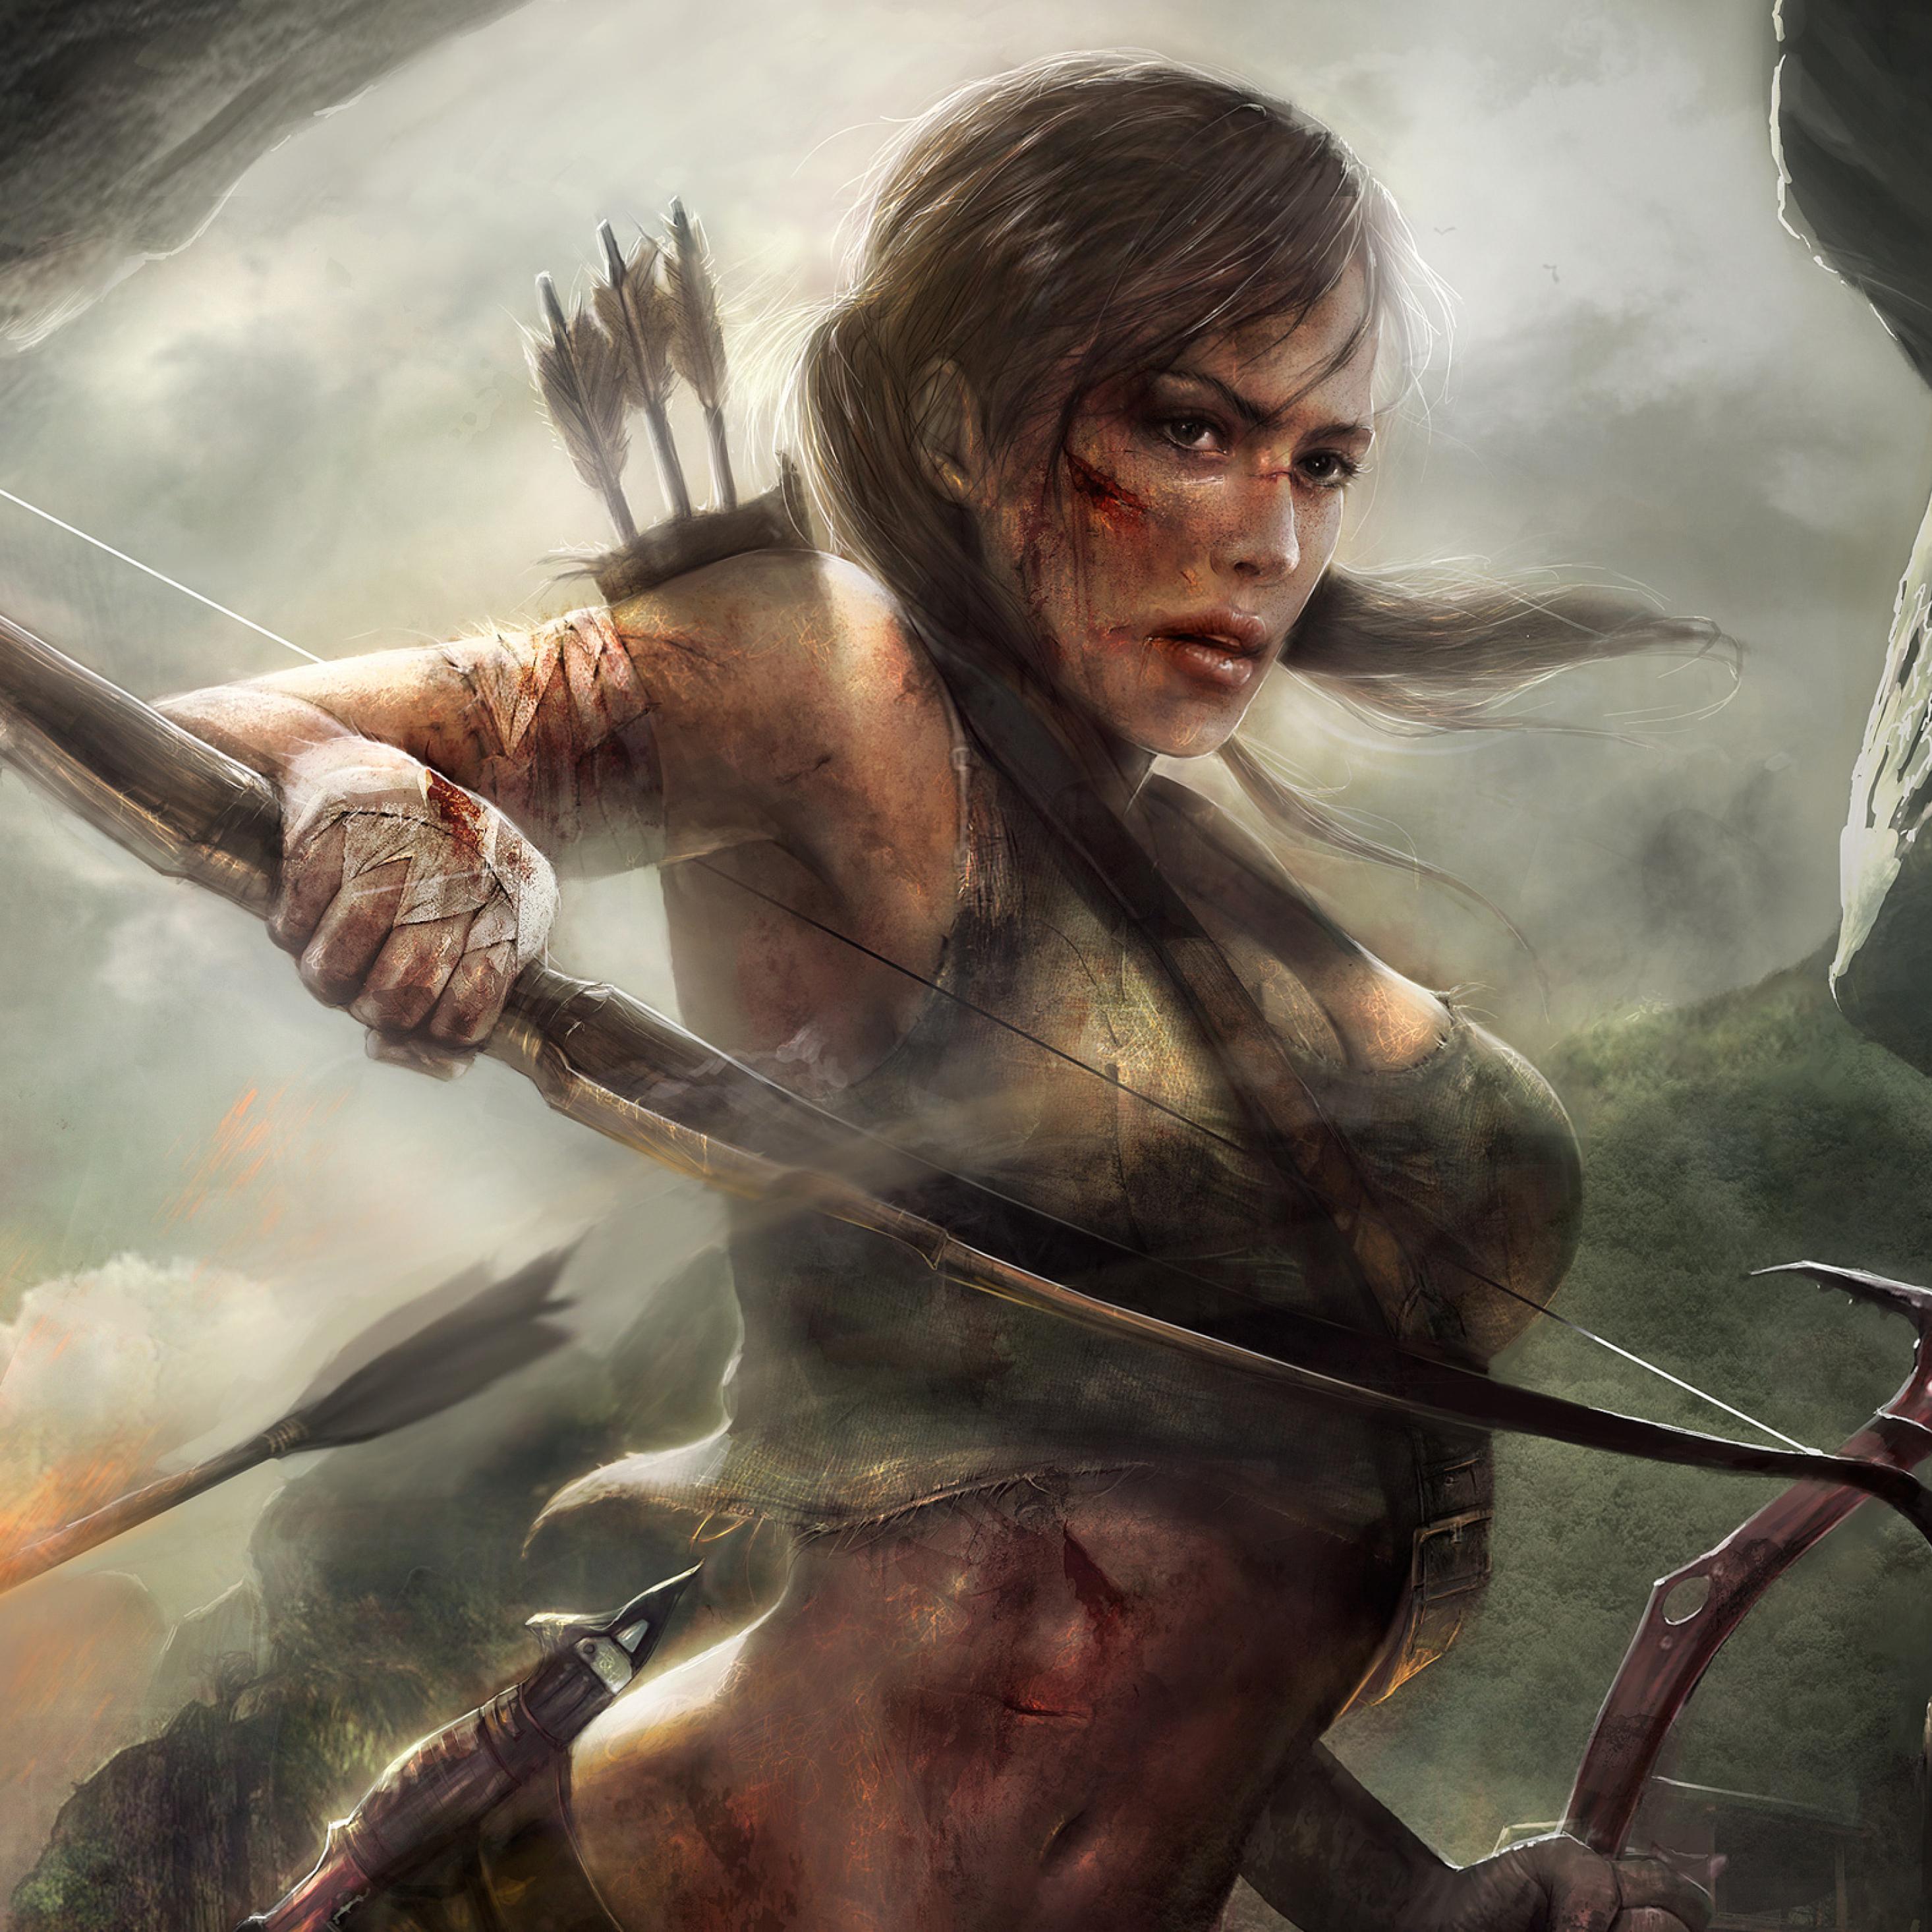 Tomb Raider Iphone Wallpaper: Lara Croft Tomb Raider Artwork, Full HD 2K Wallpaper